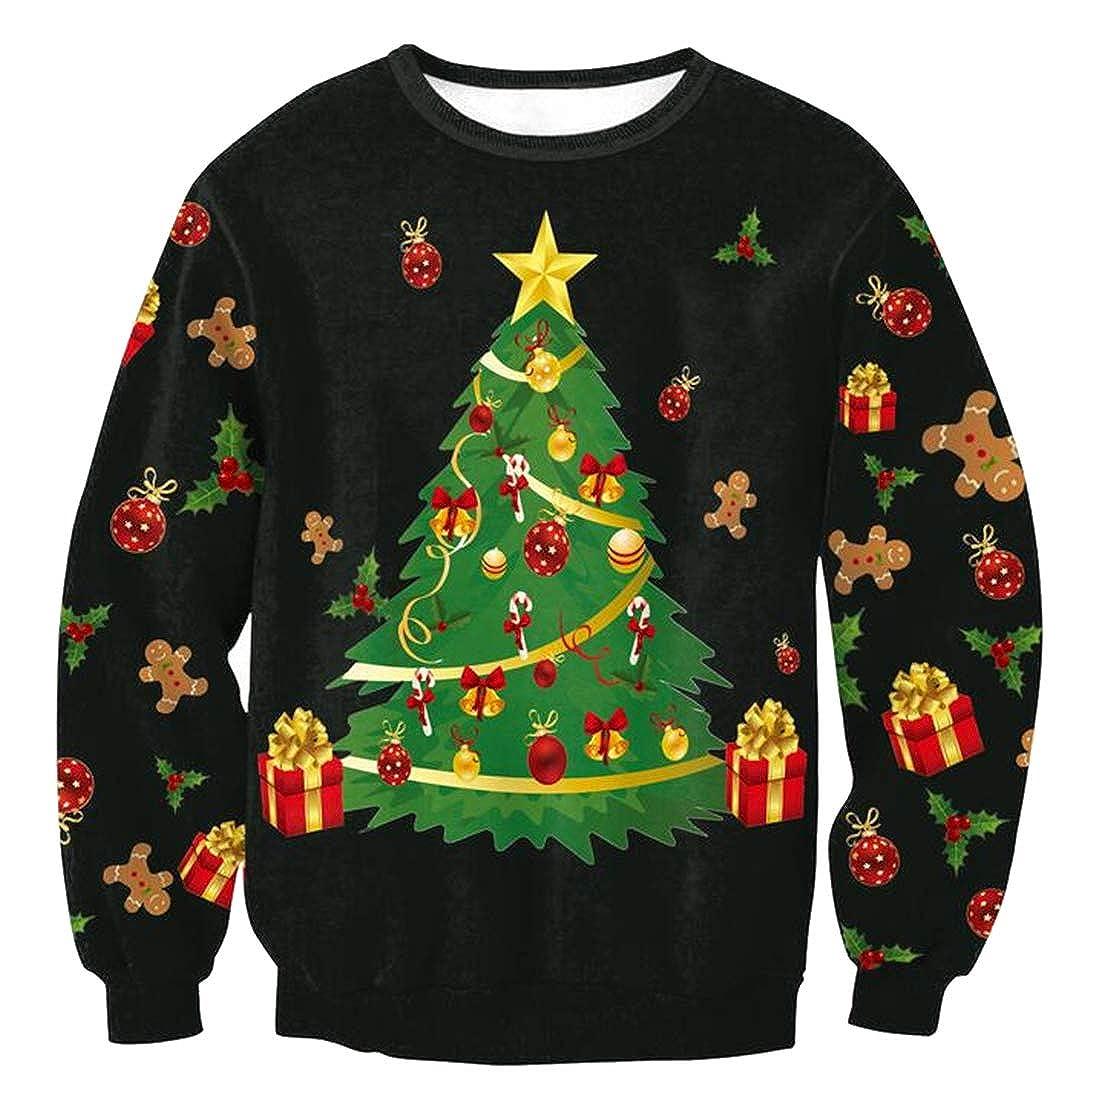 Jotebriyo Womens Loose Fit Christmas Printed Long Sleeve Casual Round Neck Pullover Sweatshirt Top